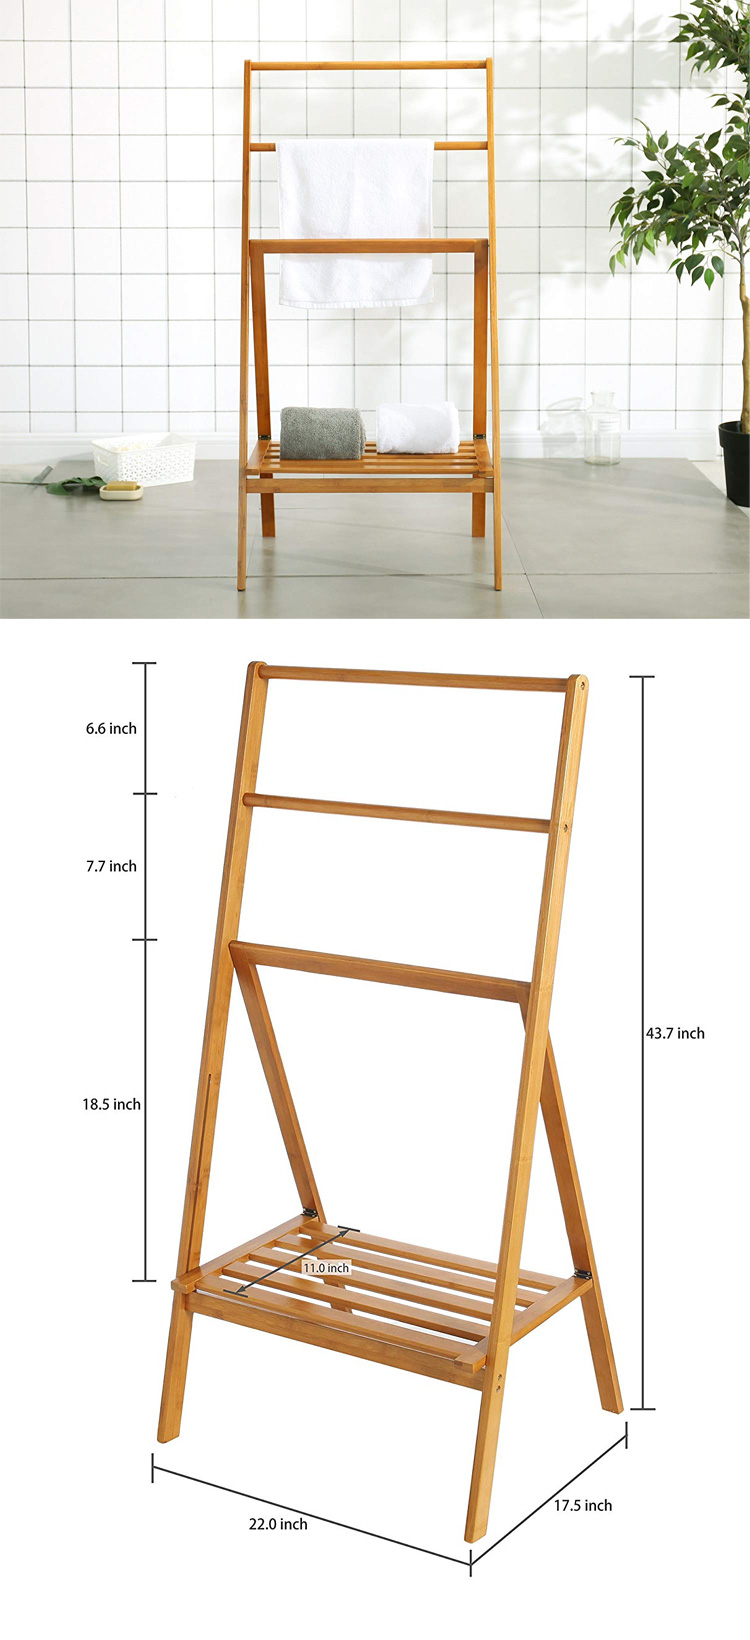 Freestanding 43 Inch Bamboo Folding Towel Stand Shelf